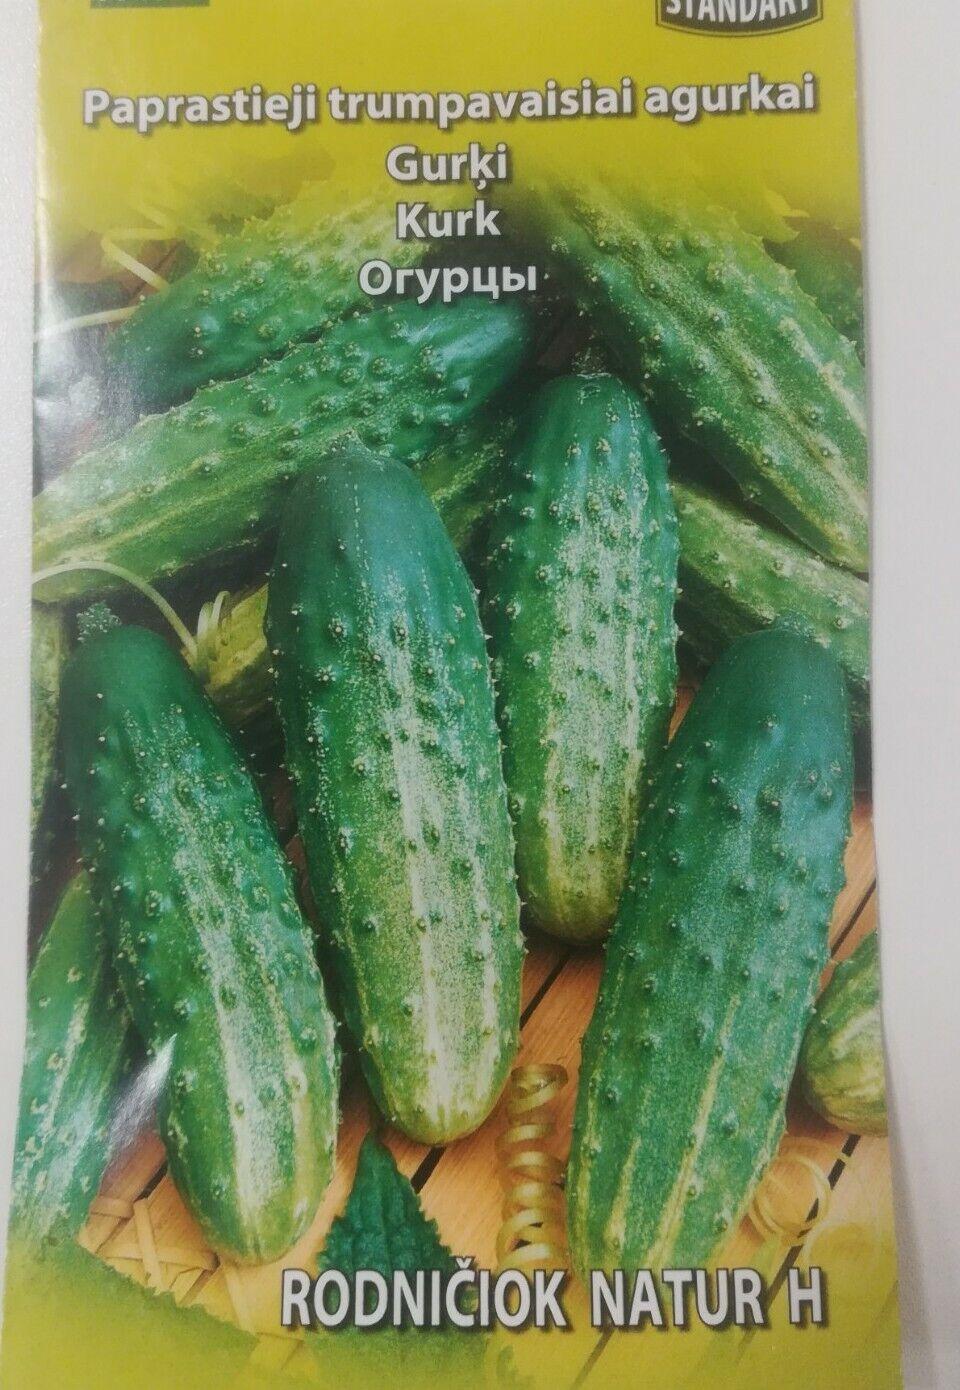 Cucumber seeds *Rodnichok Natur H*Gherkin Tolerant to mildew & weather stress *